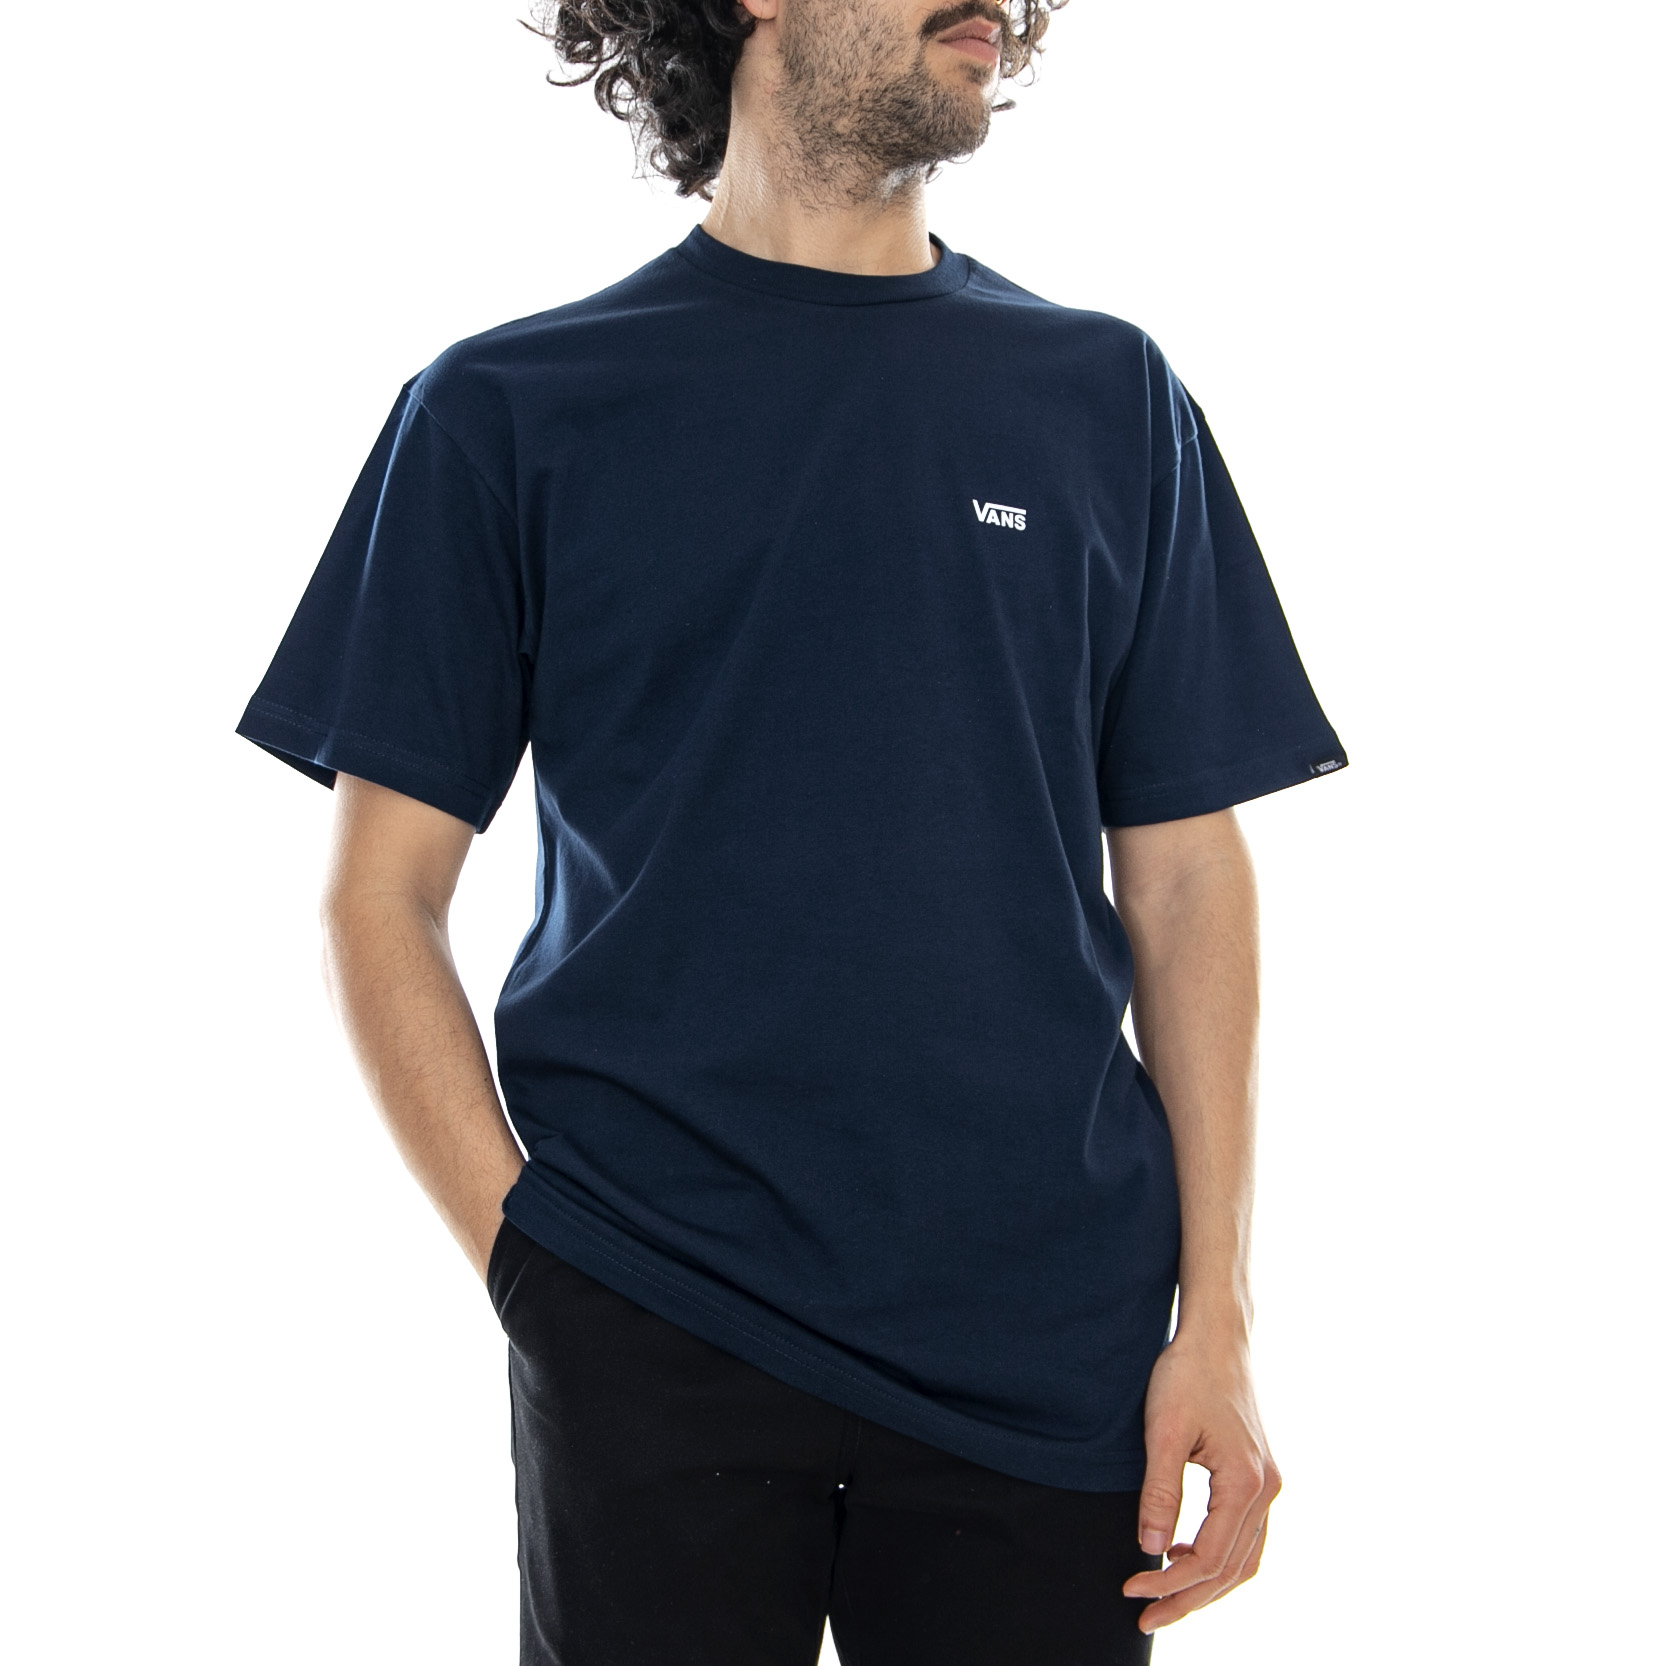 2830630b Details about Vans Mn Left Chest Logo Tee Navy/White - T-shirt Crew-neck  Man Blue